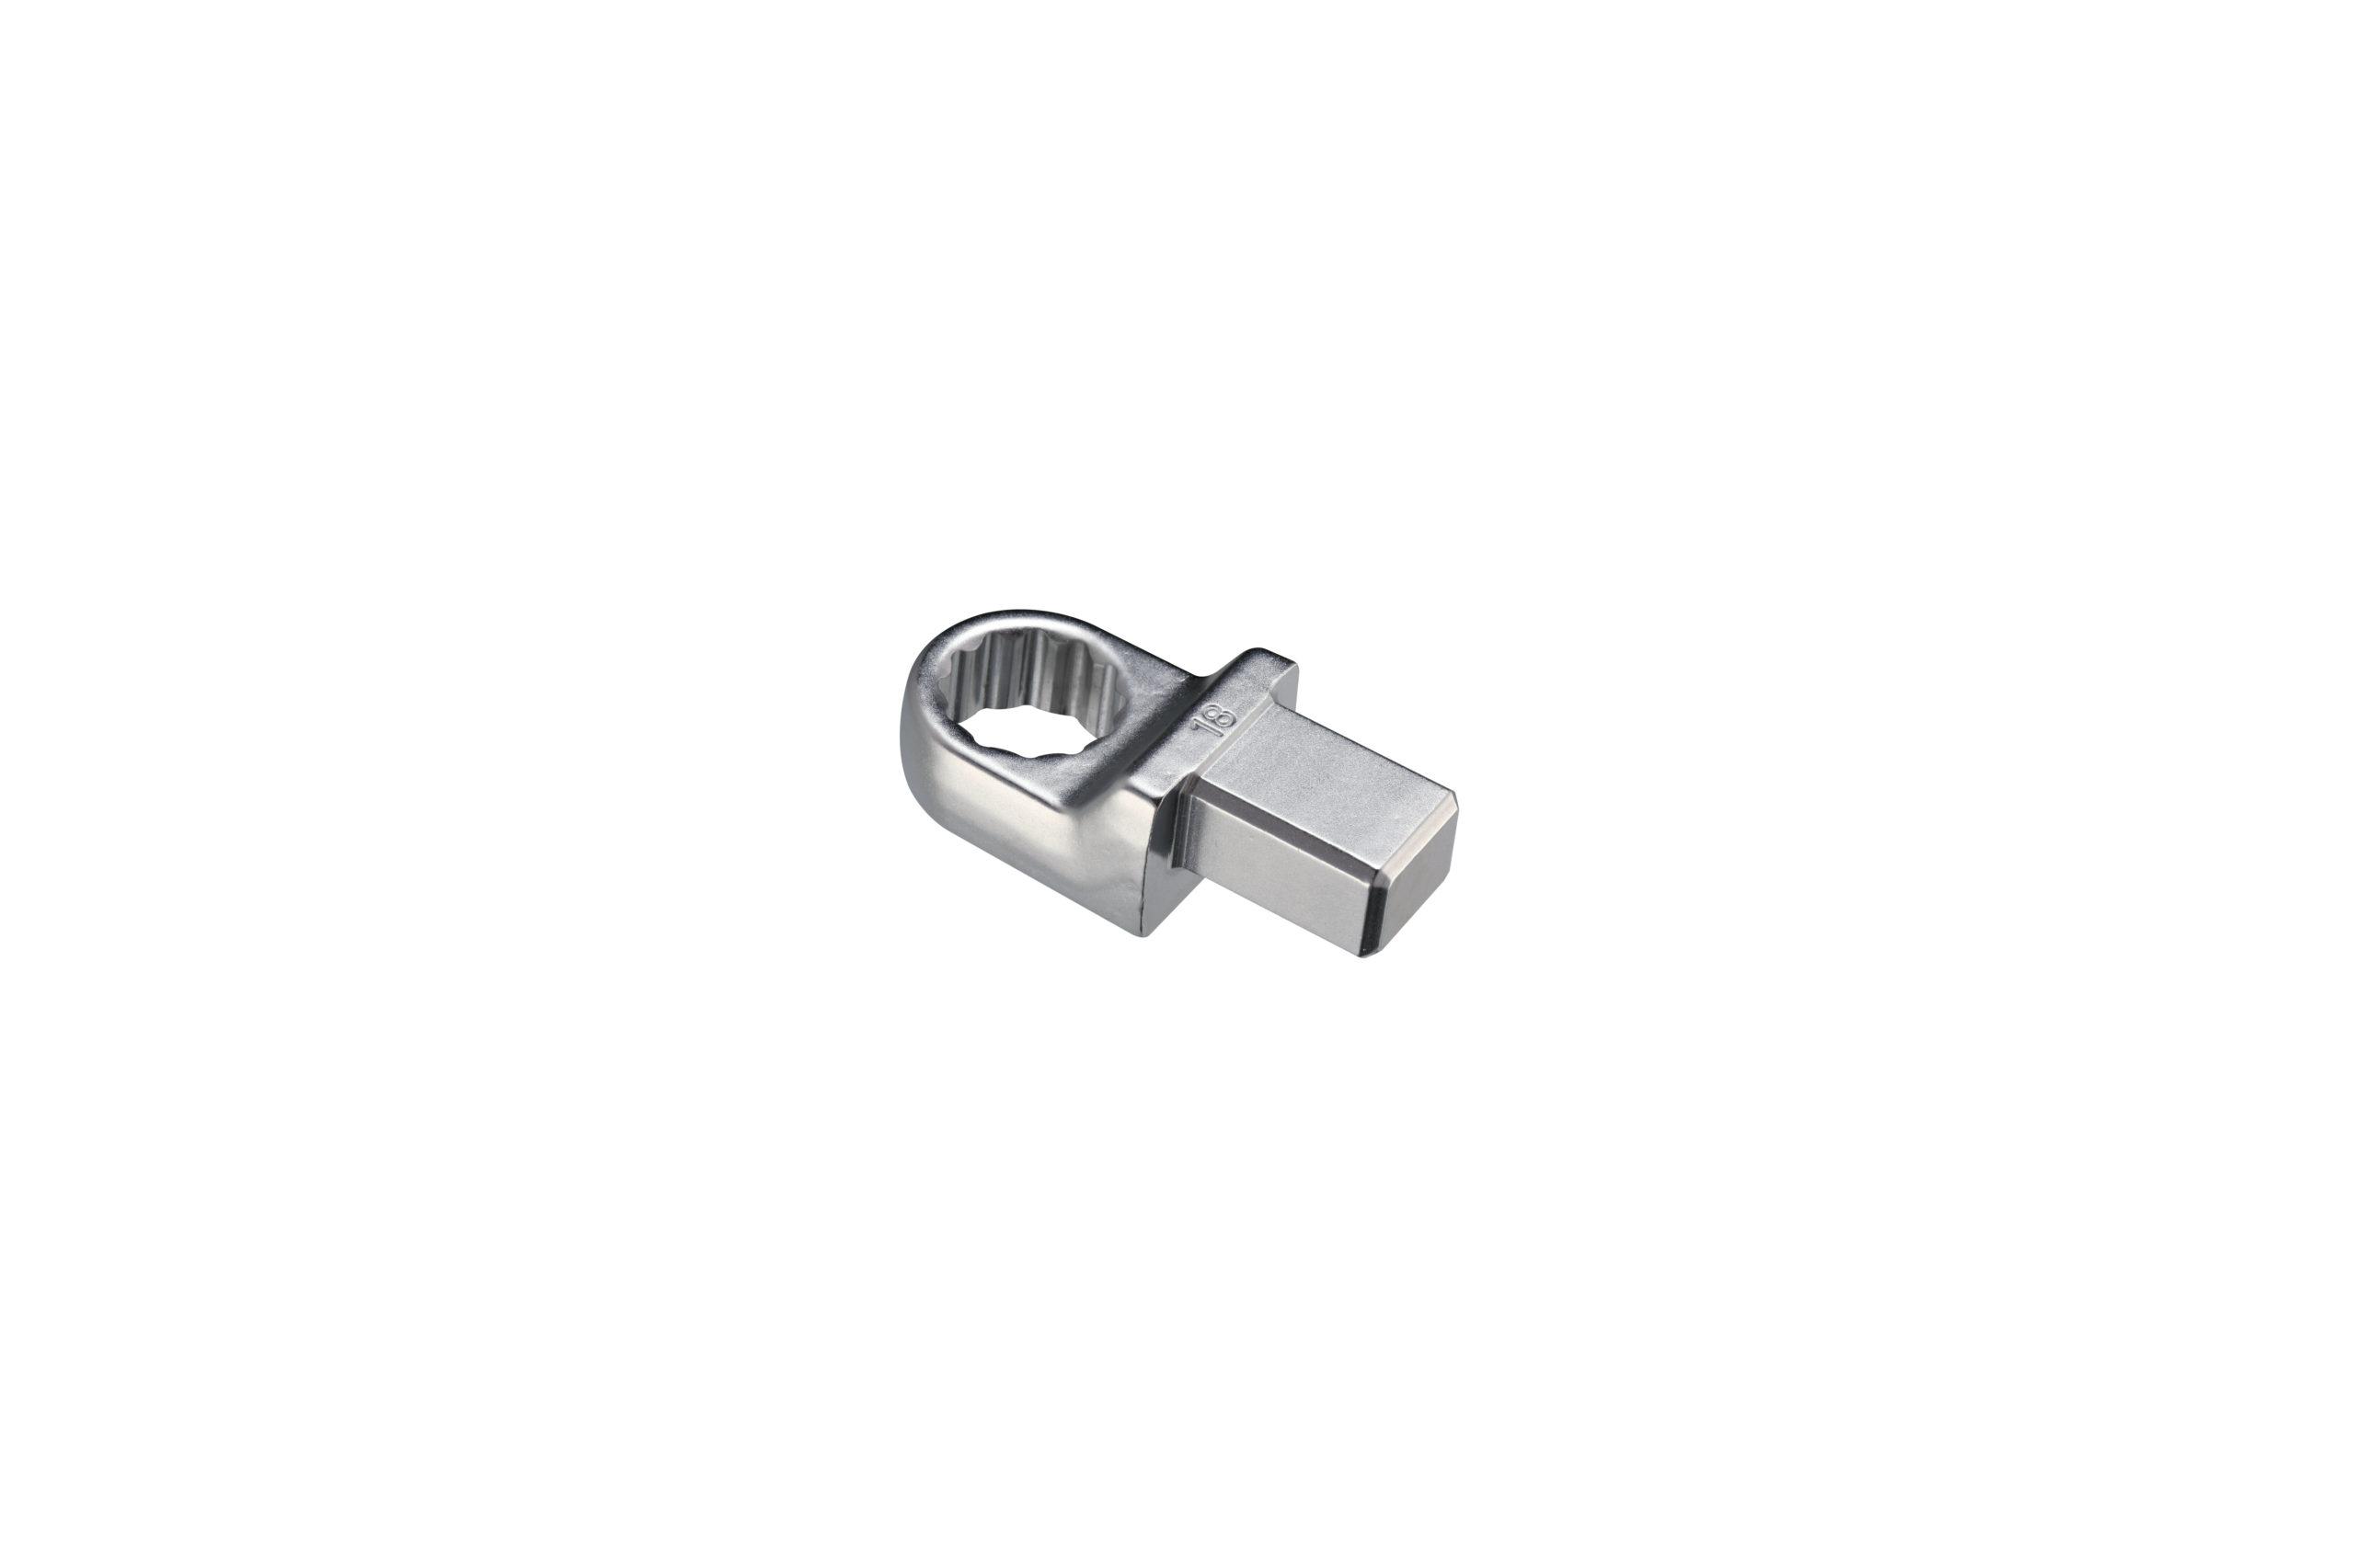 Ring End Insert 14X18mm-36mm